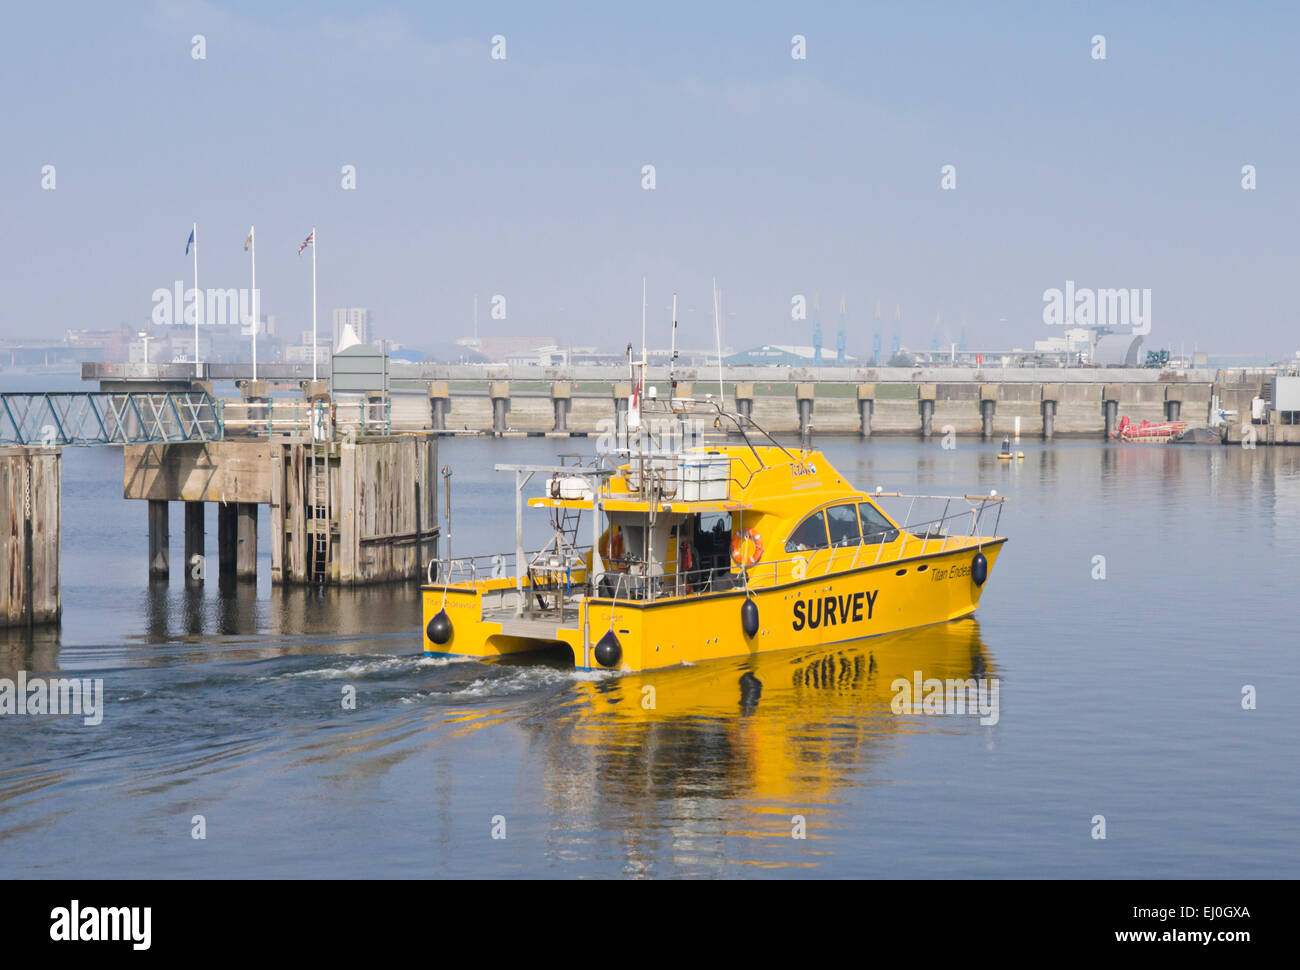 MV Titan Endeavour a survey vessel for Titan Environmental surveys Ltd, Penarth Marina. - Stock Image